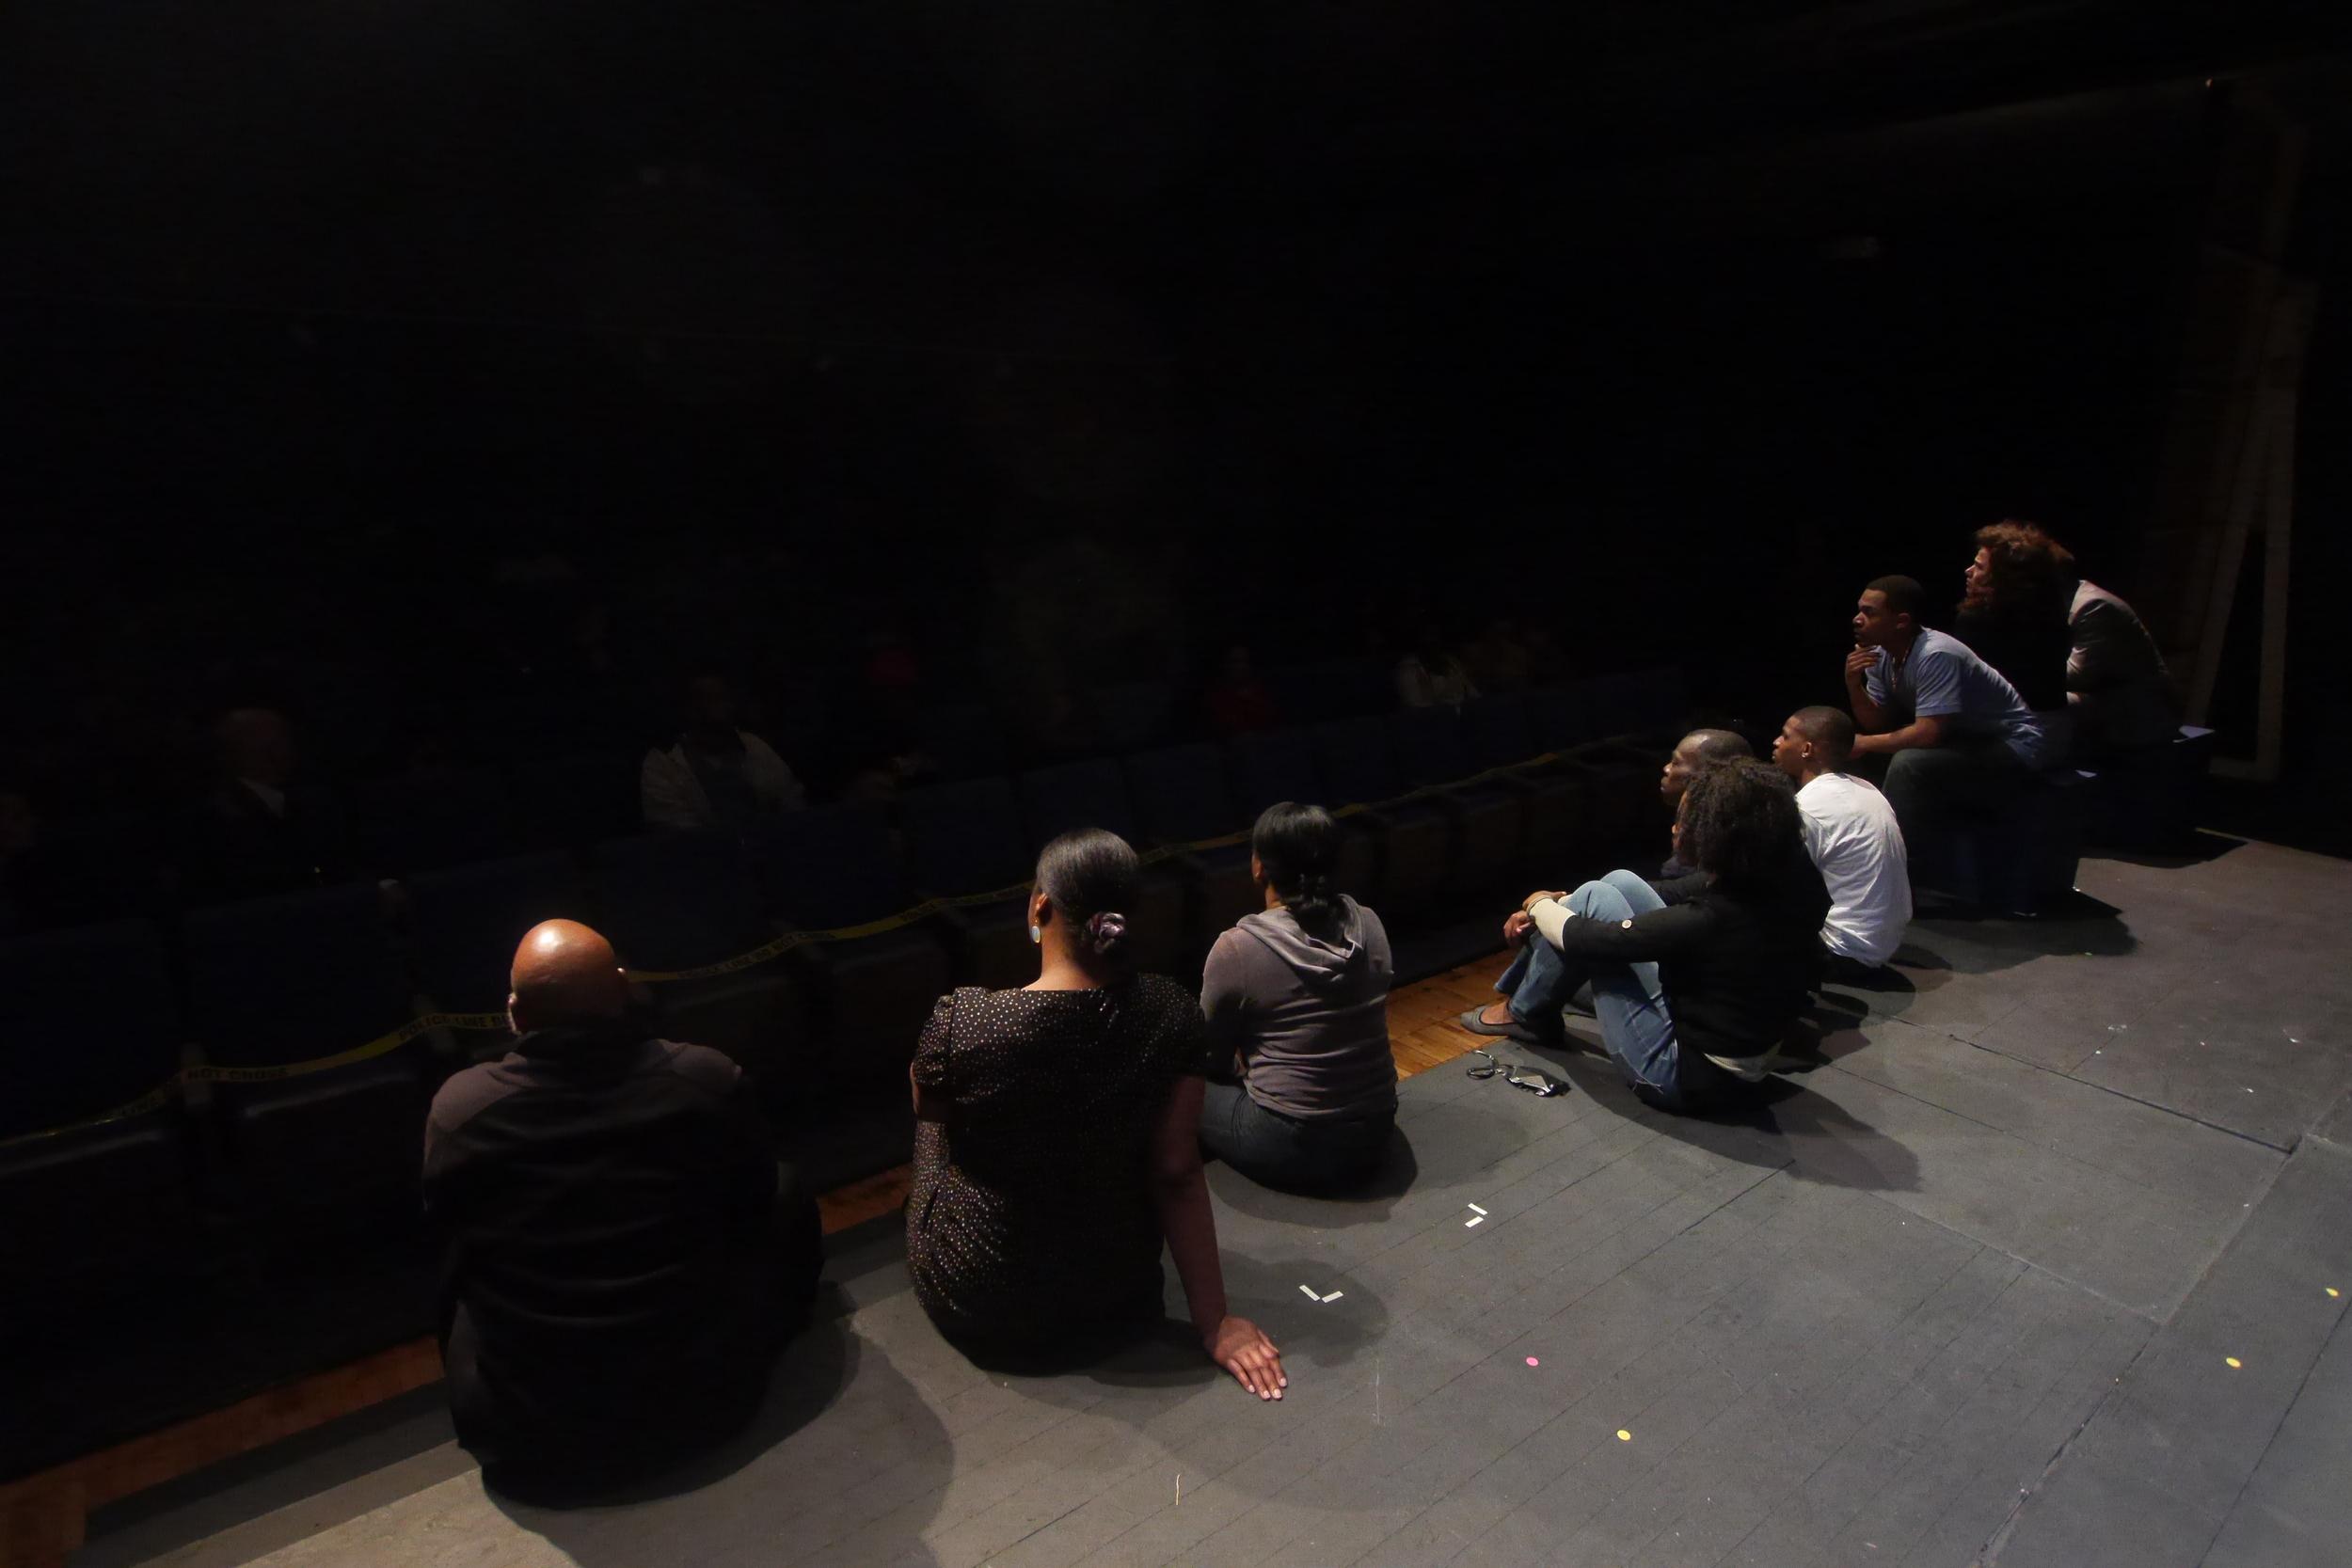 company-members-in-rehearsal_13761549534_o.jpg